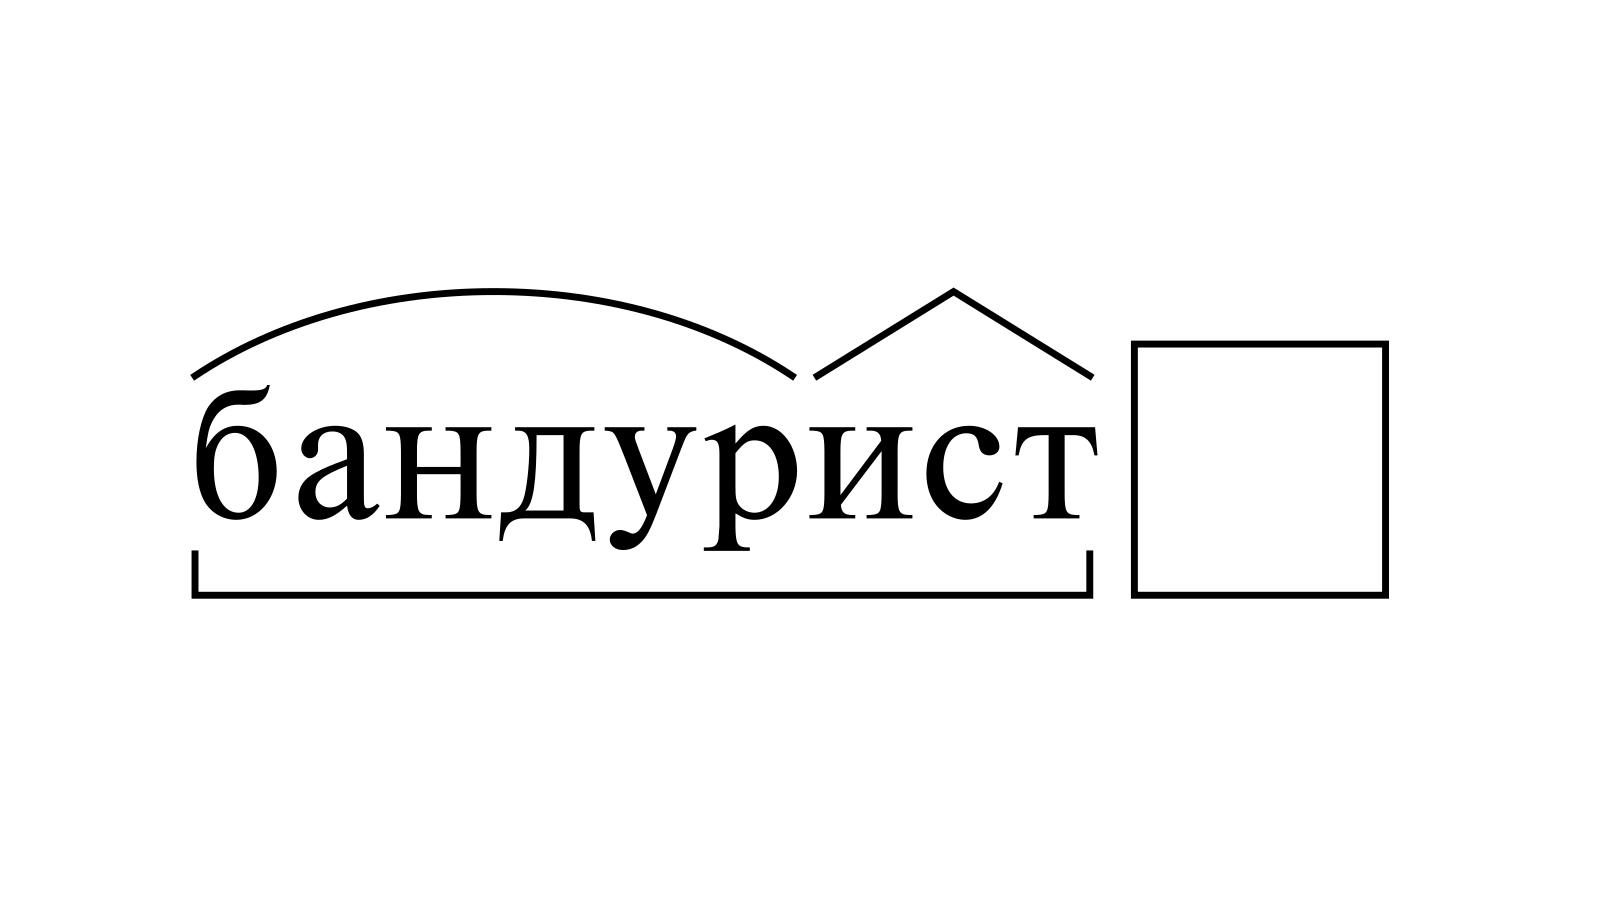 Разбор слова «бандурист» по составу